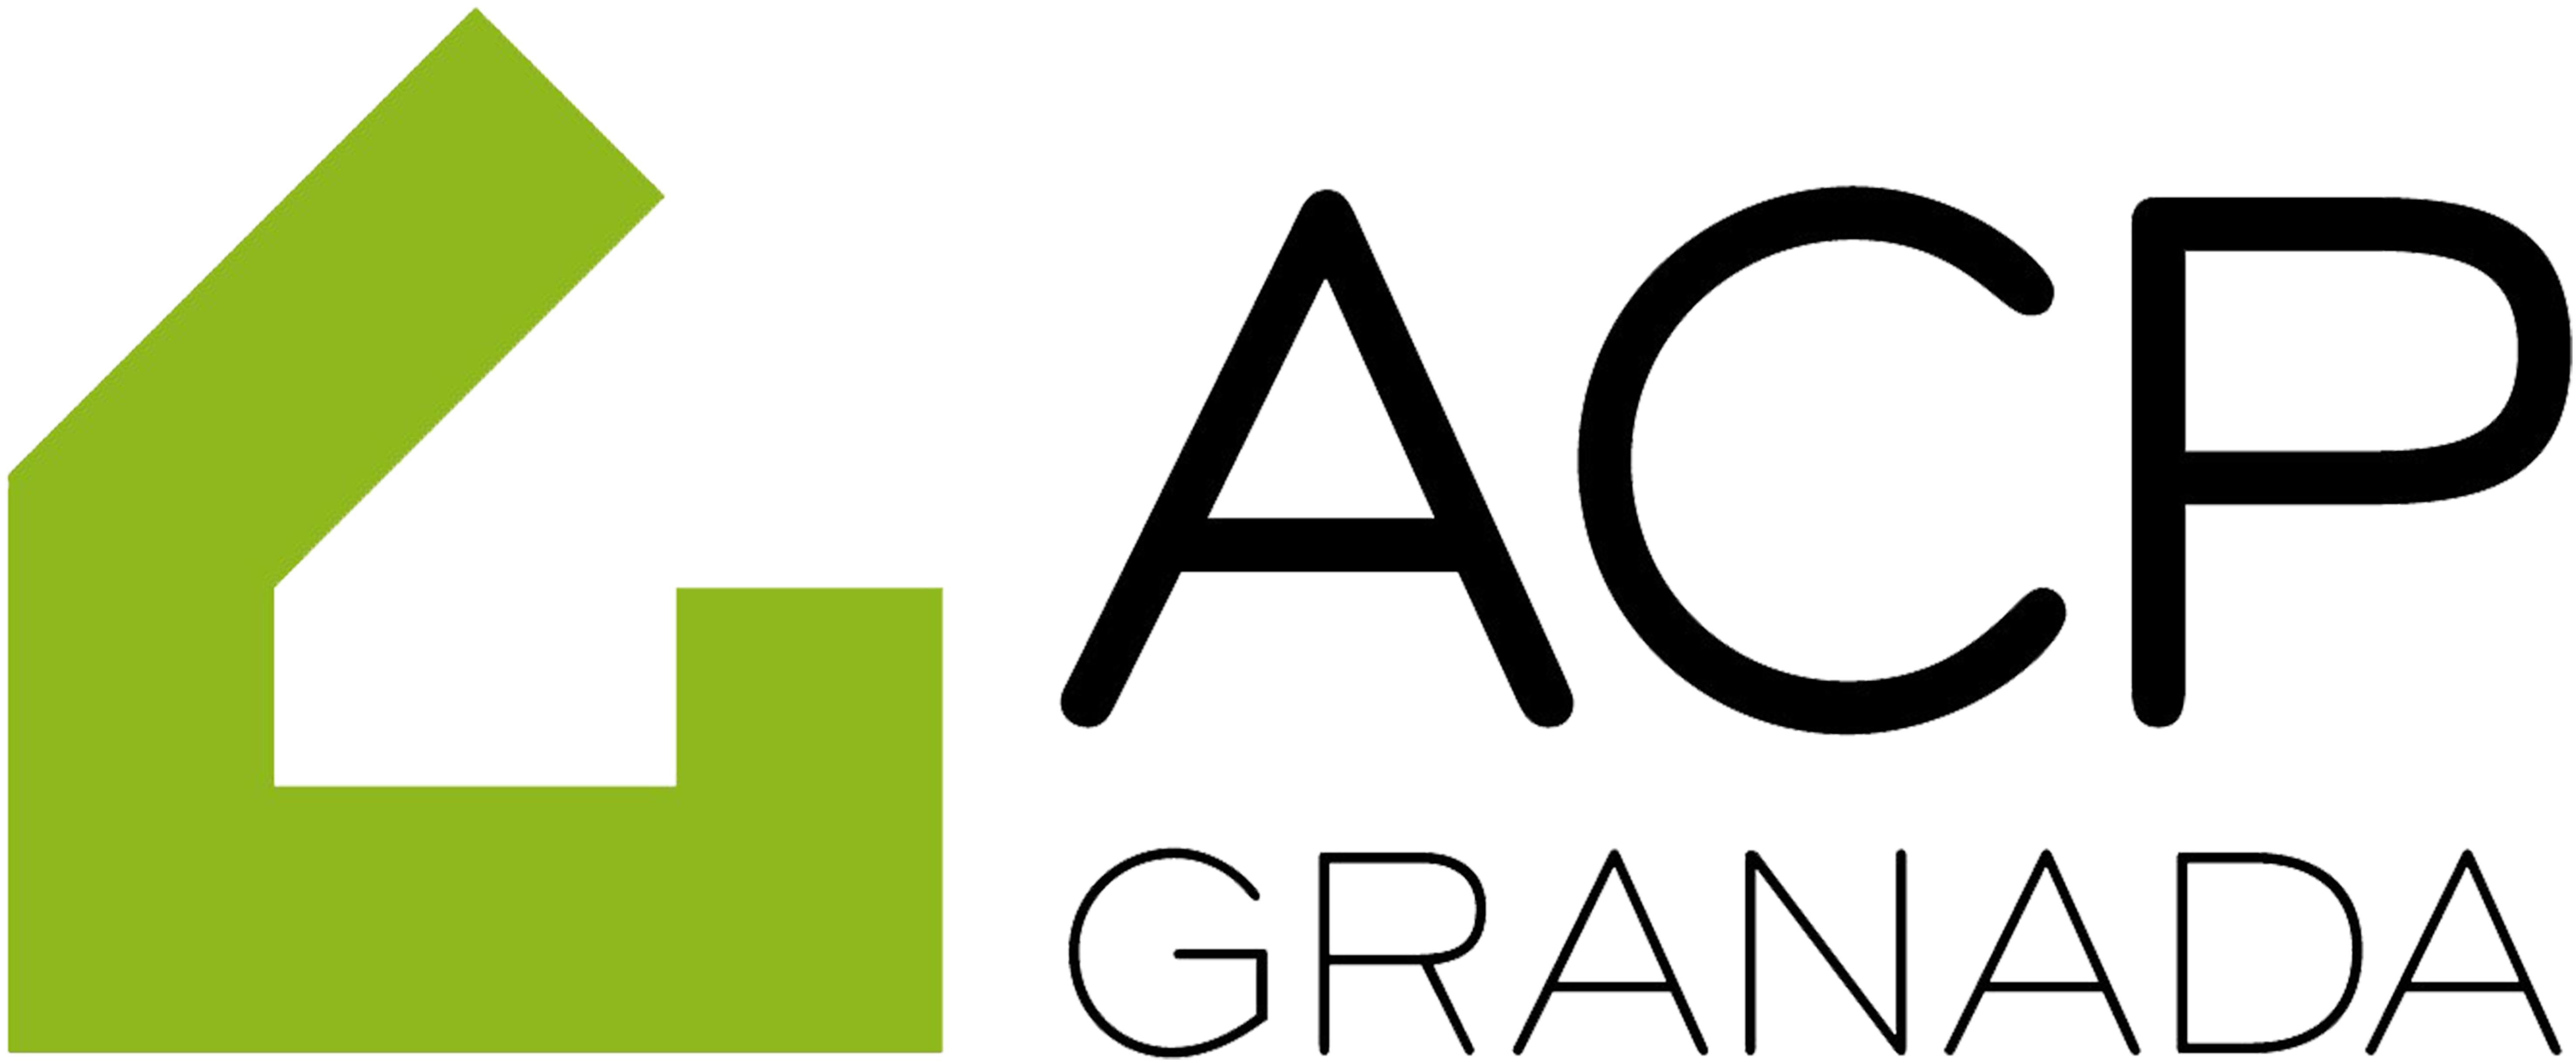 logo_acp_granada